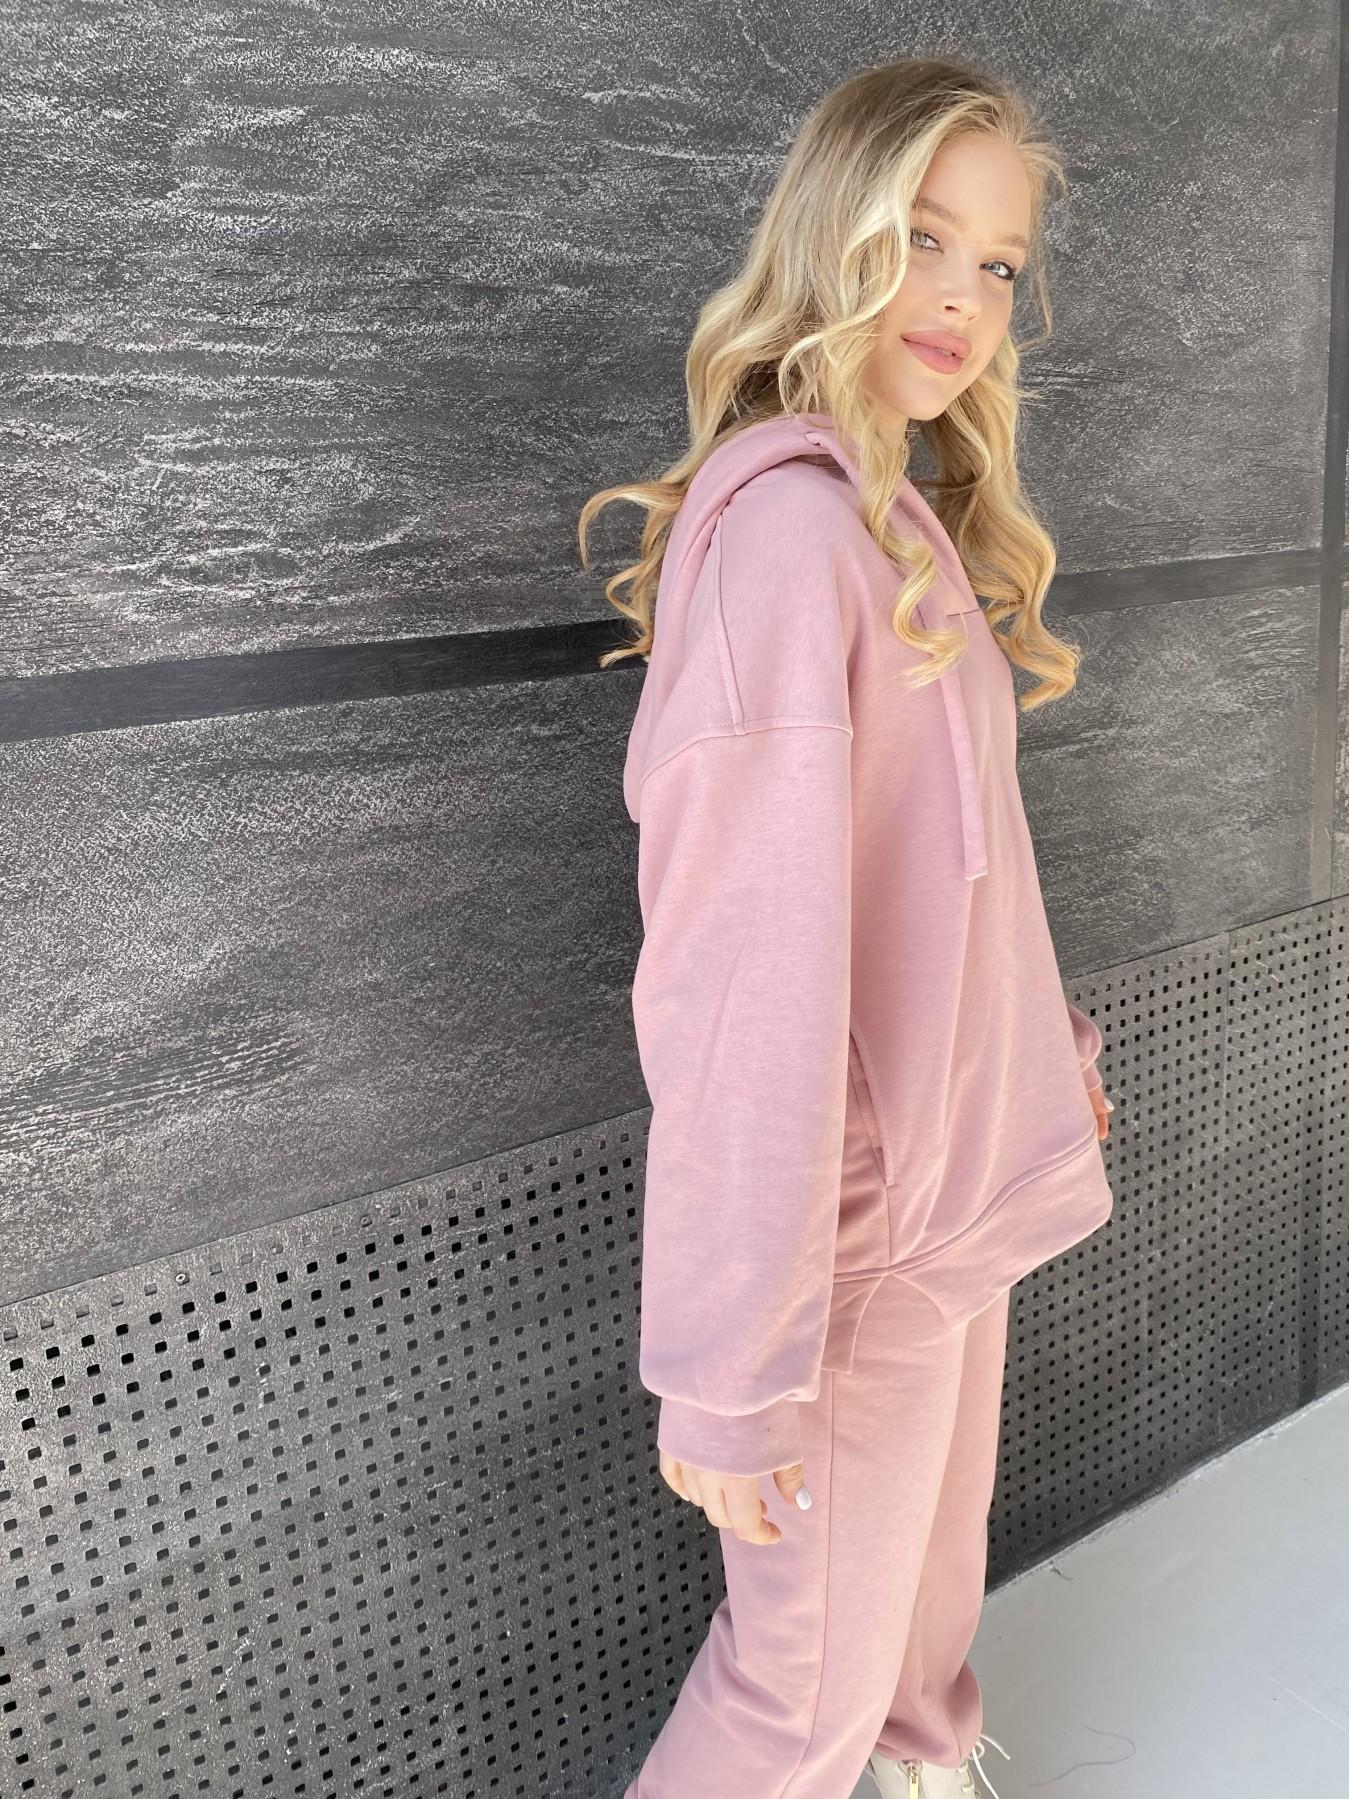 Ярис костюм из 3х нитки 10789 АРТ. 47262 Цвет: Пудра - фото 4, интернет магазин tm-modus.ru